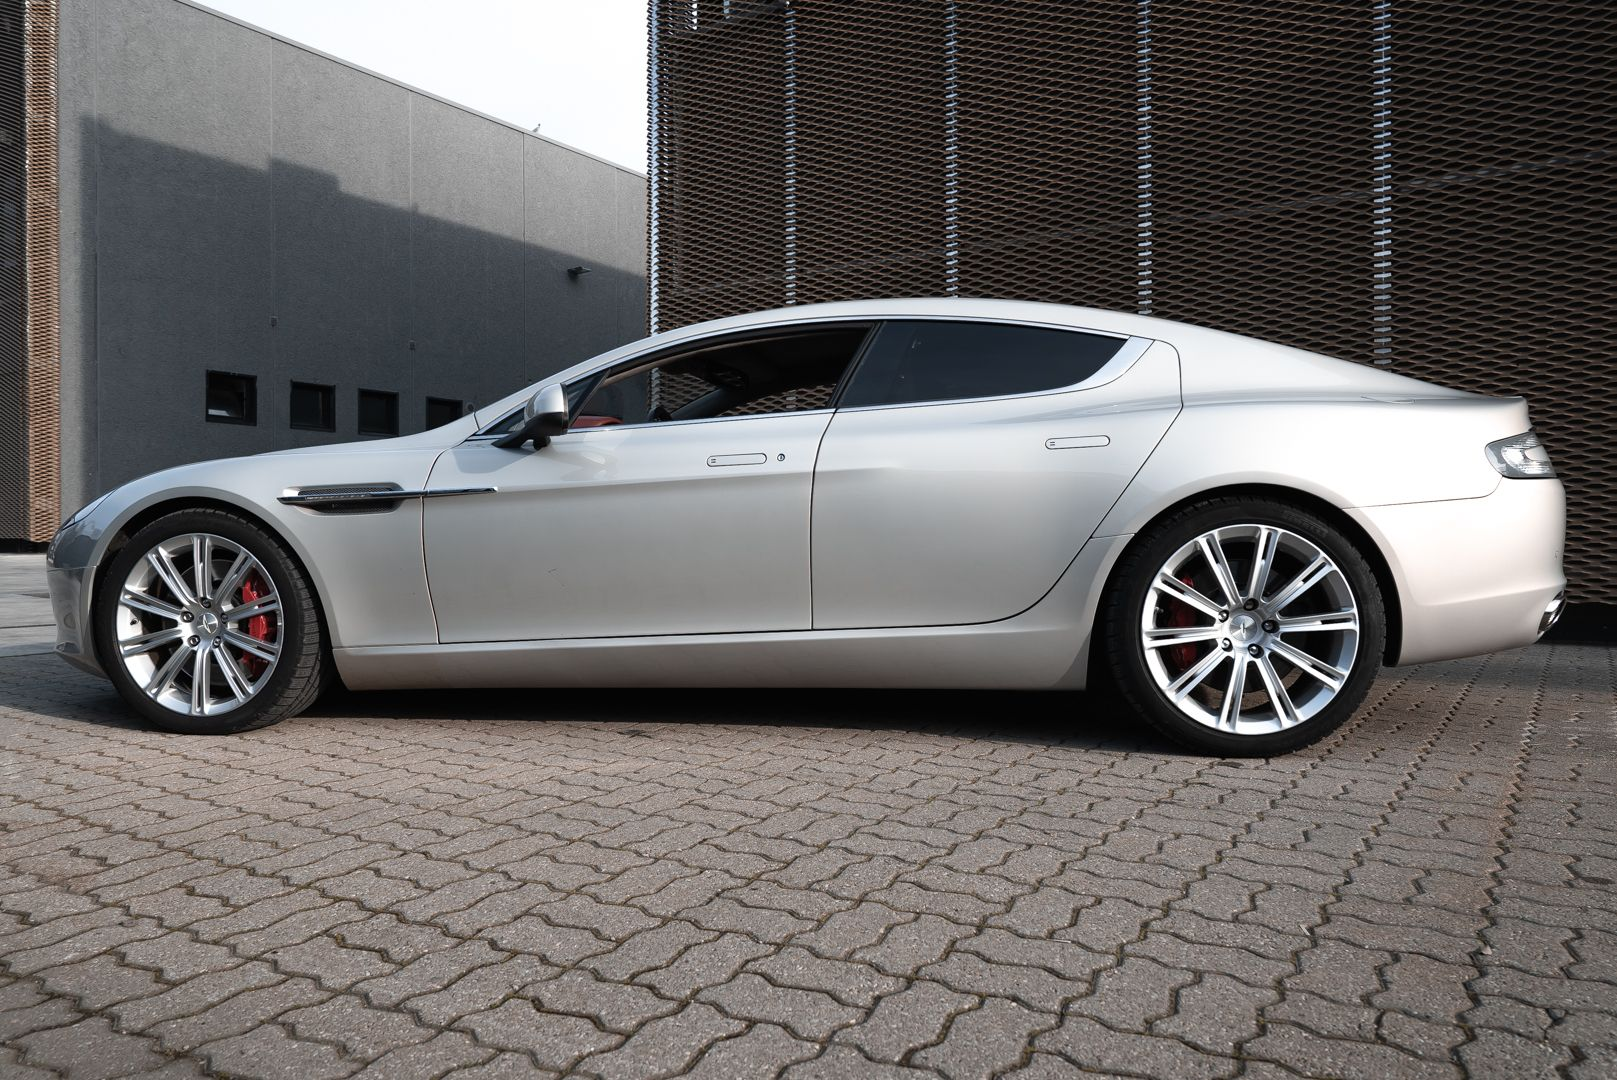 2010 Aston Martin Rapide 6.0 V12 62559